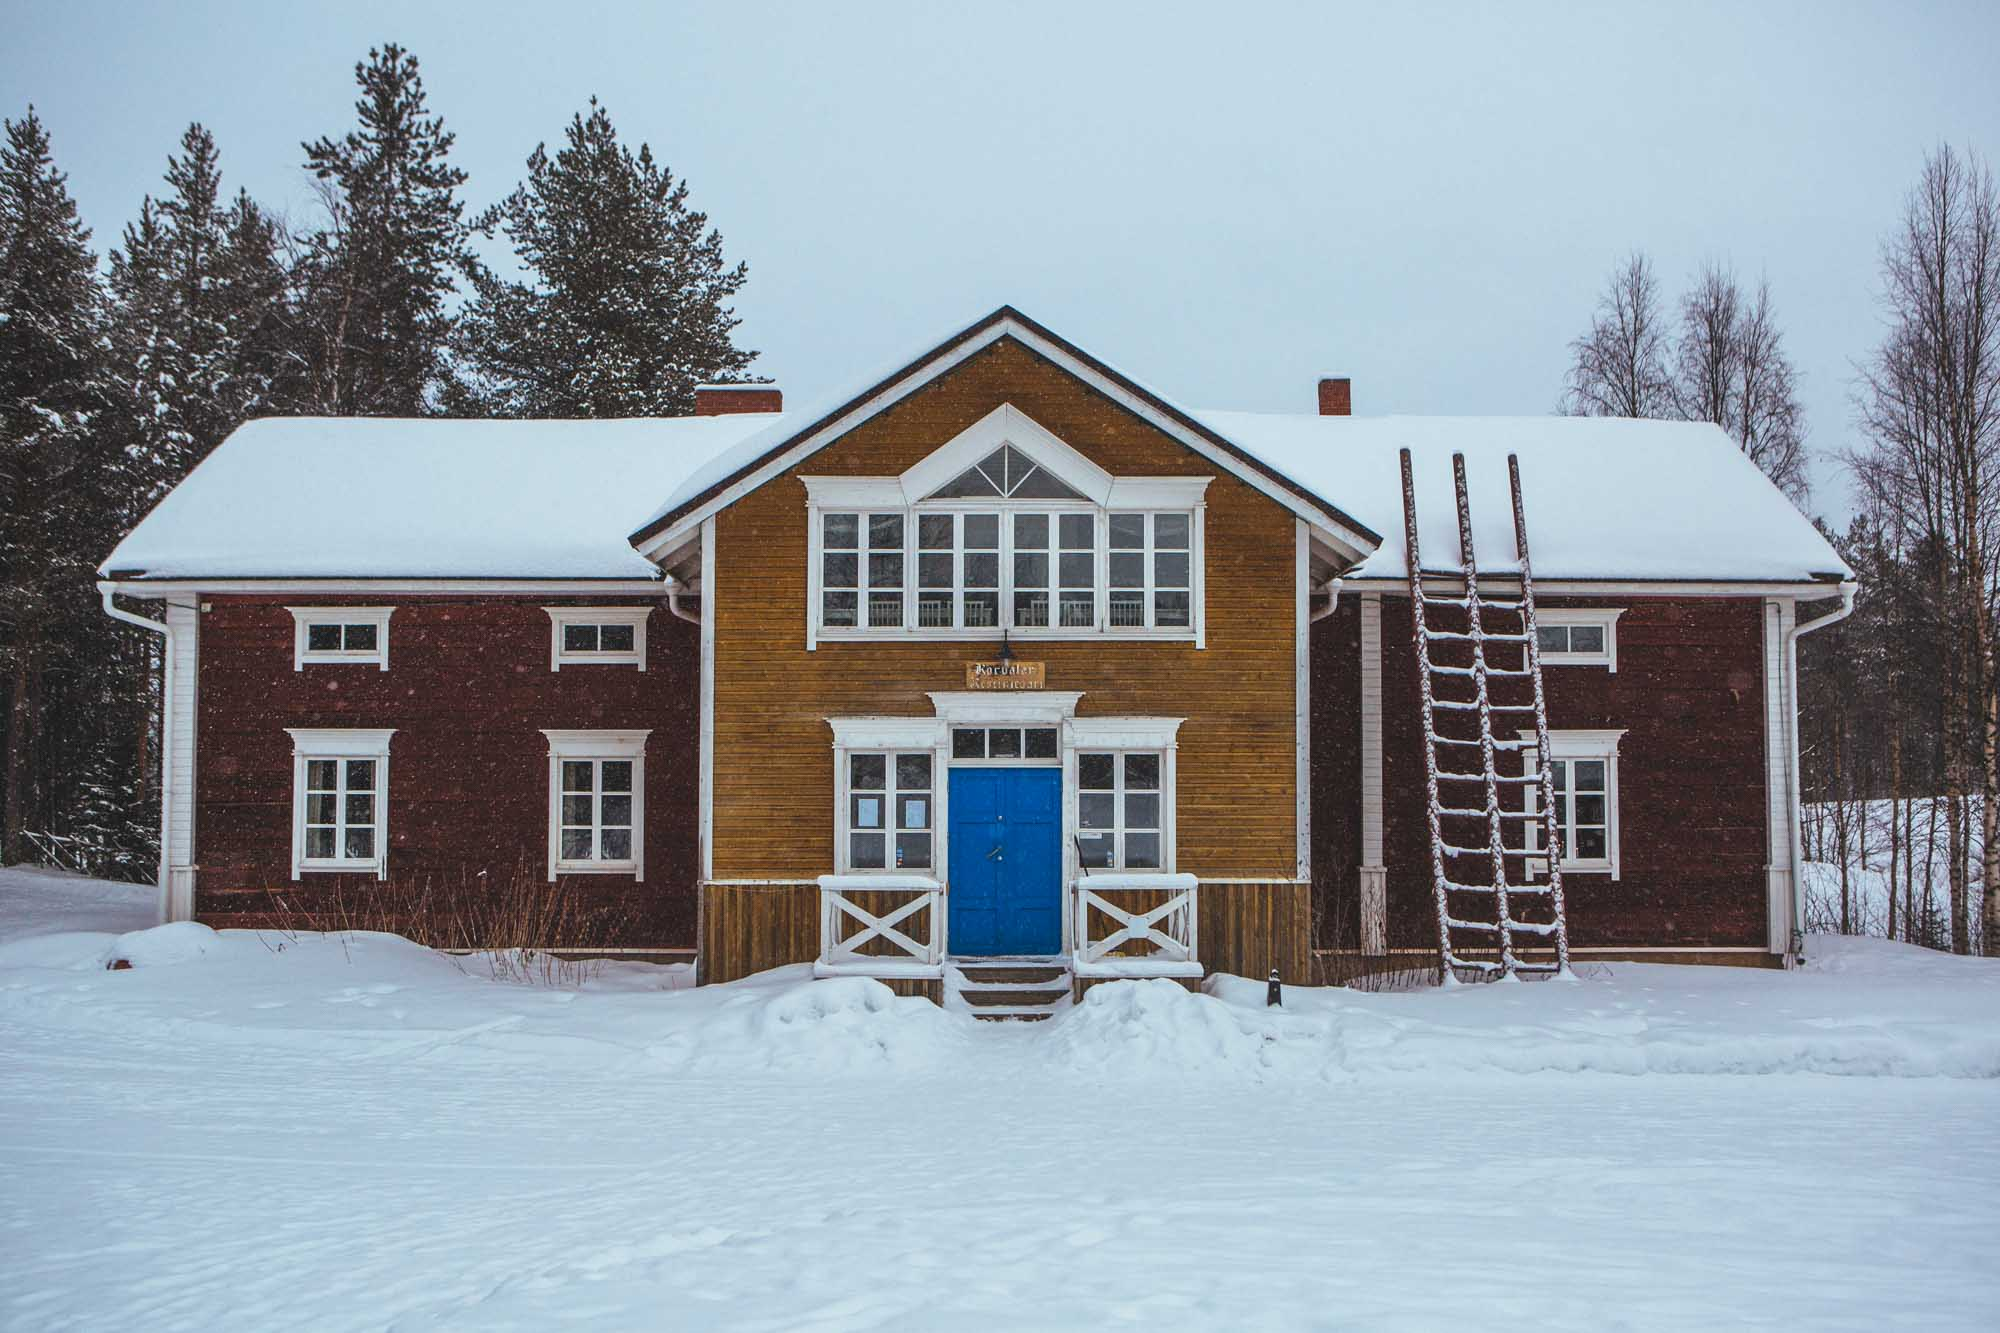 Huskies at Korvala - 5-day Finland itinerary Northern Lights